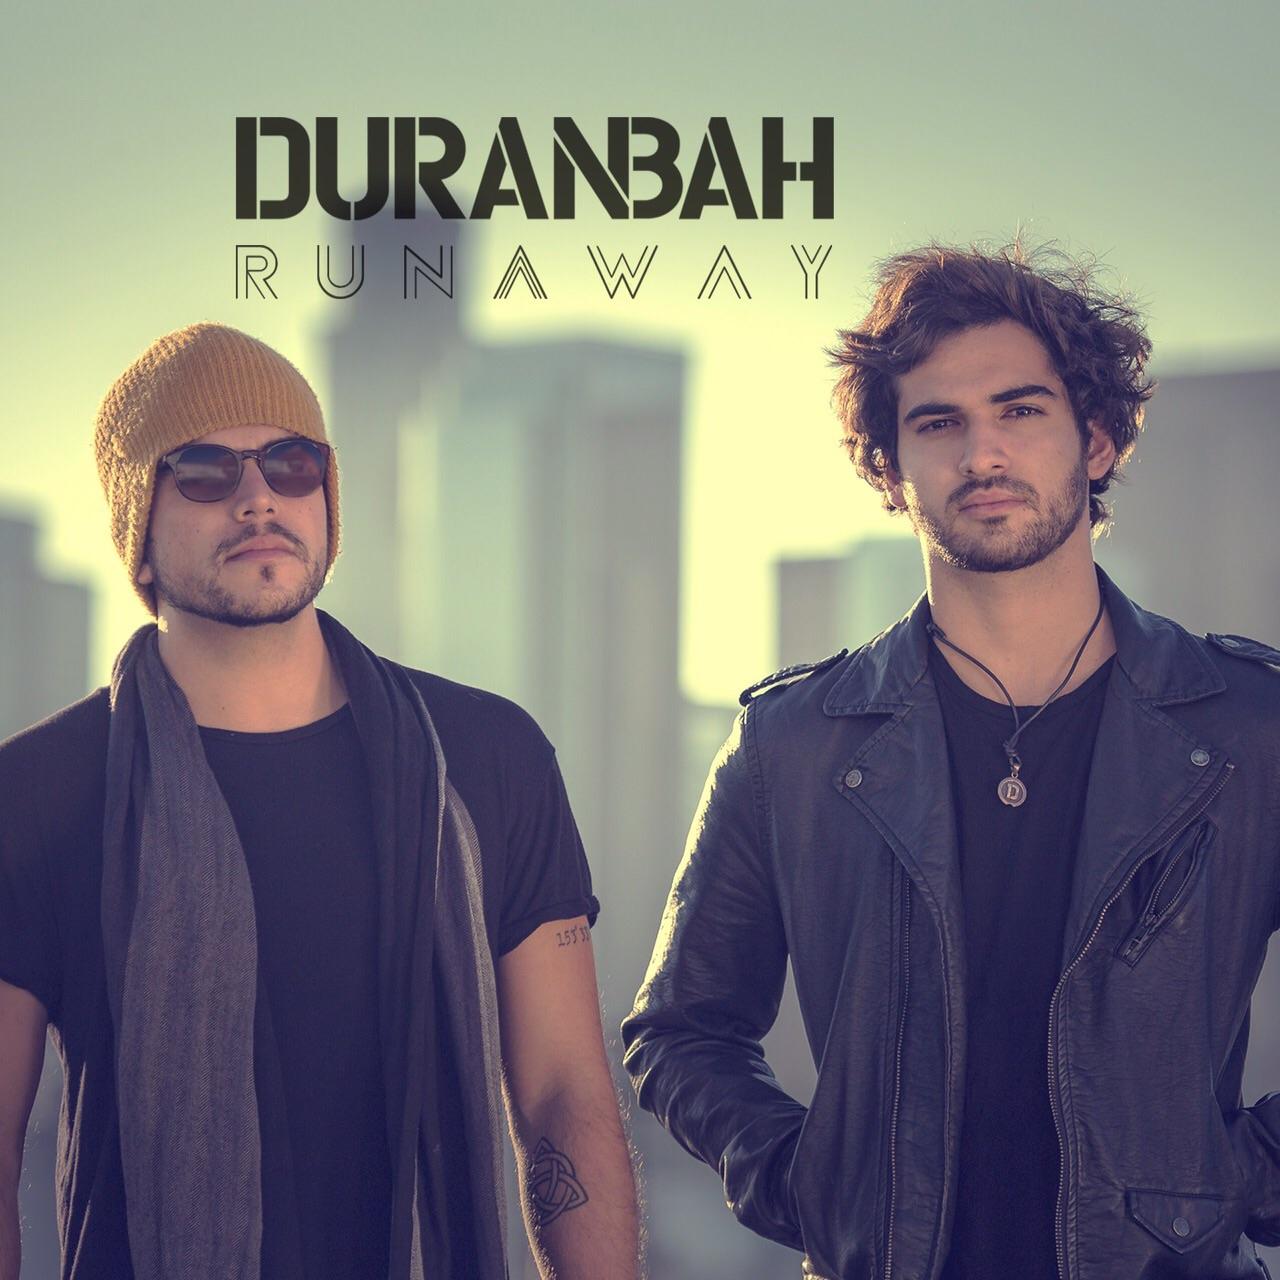 Duranbah Release New Album – Runaway